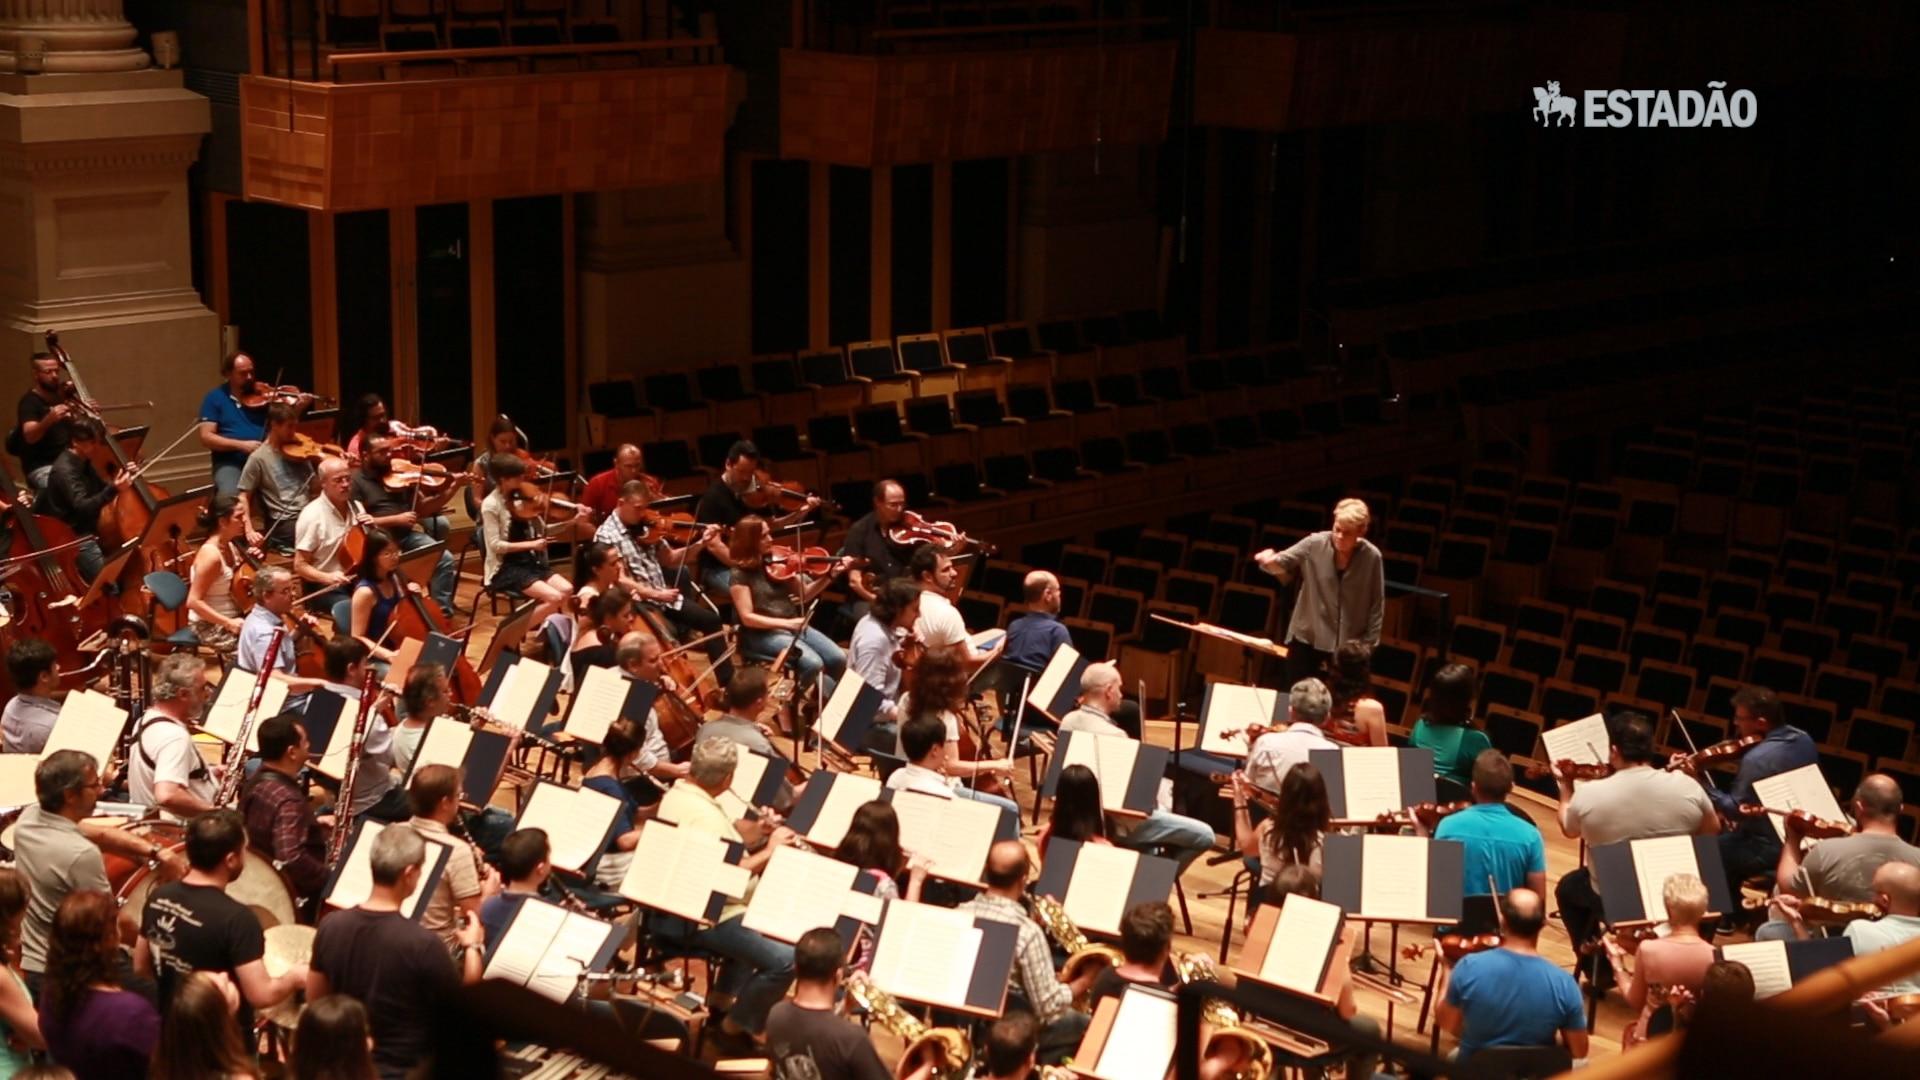 Osesp elege Beethoven para homenagear mulheres